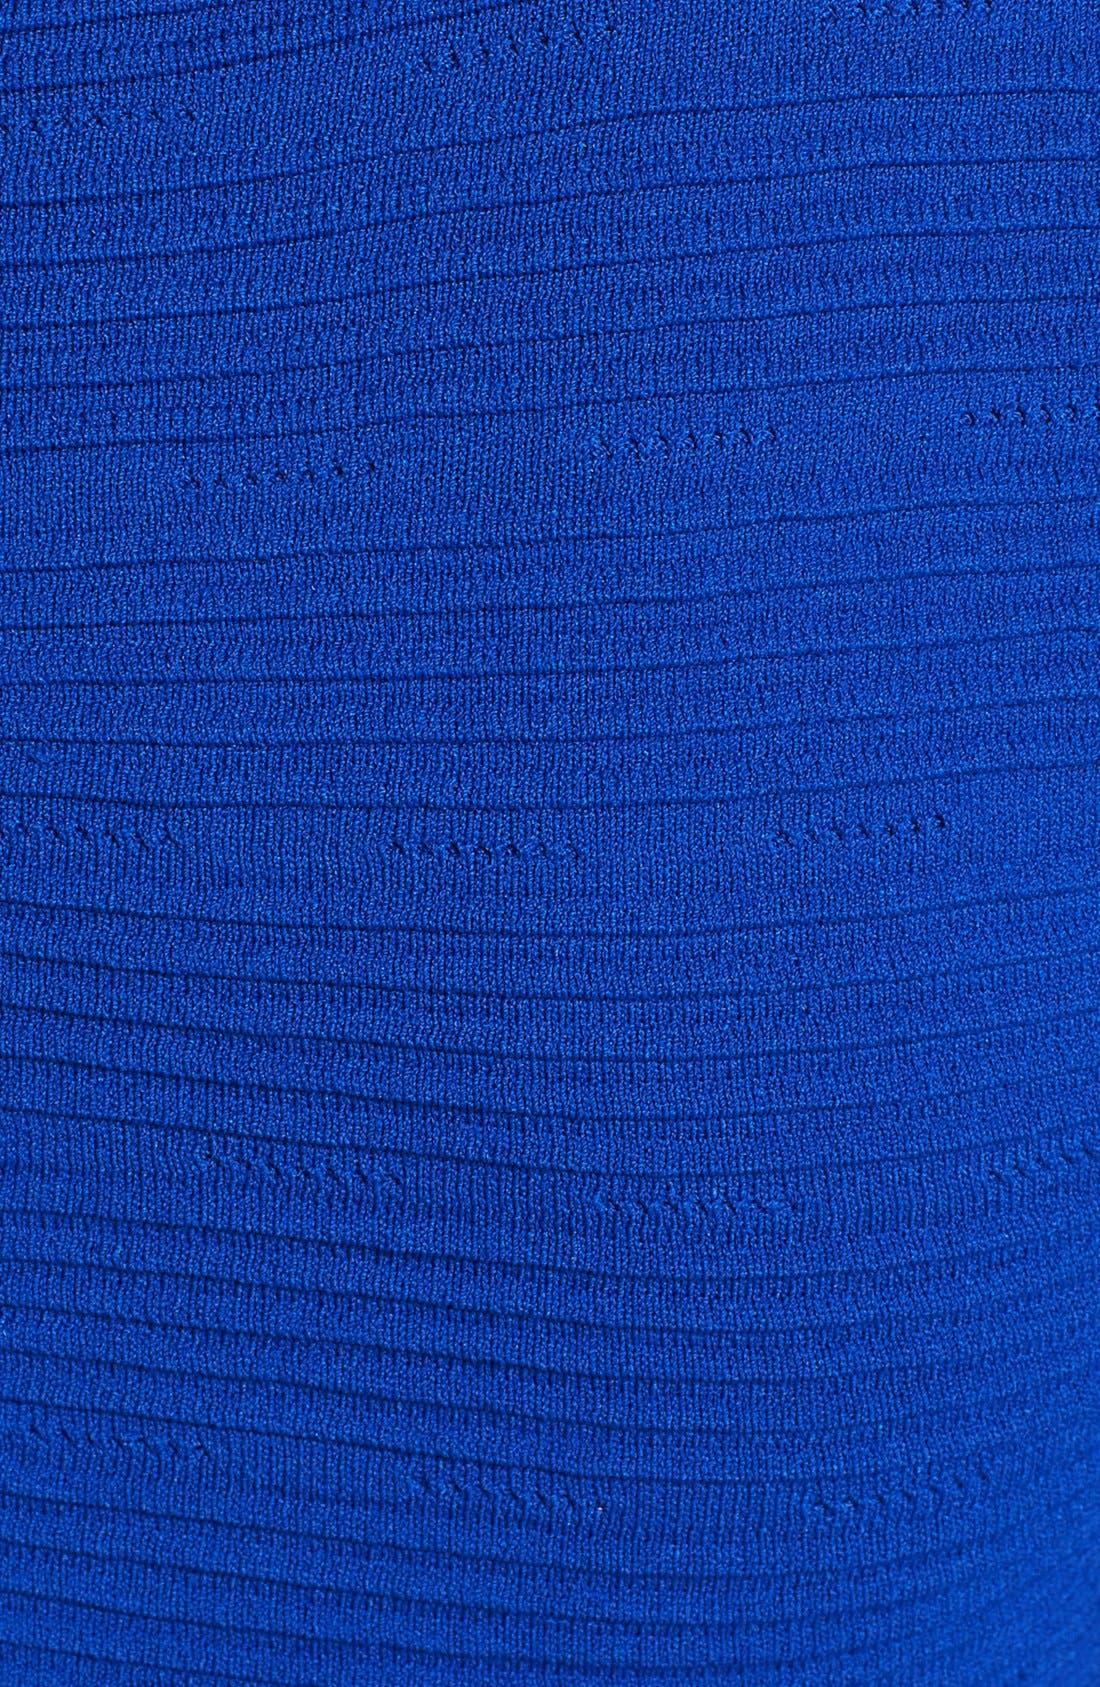 Alternate Image 3  - Felicity & Coco Knit Body-Con Midi Dress (Petite) (Nordstrom Exclusive)